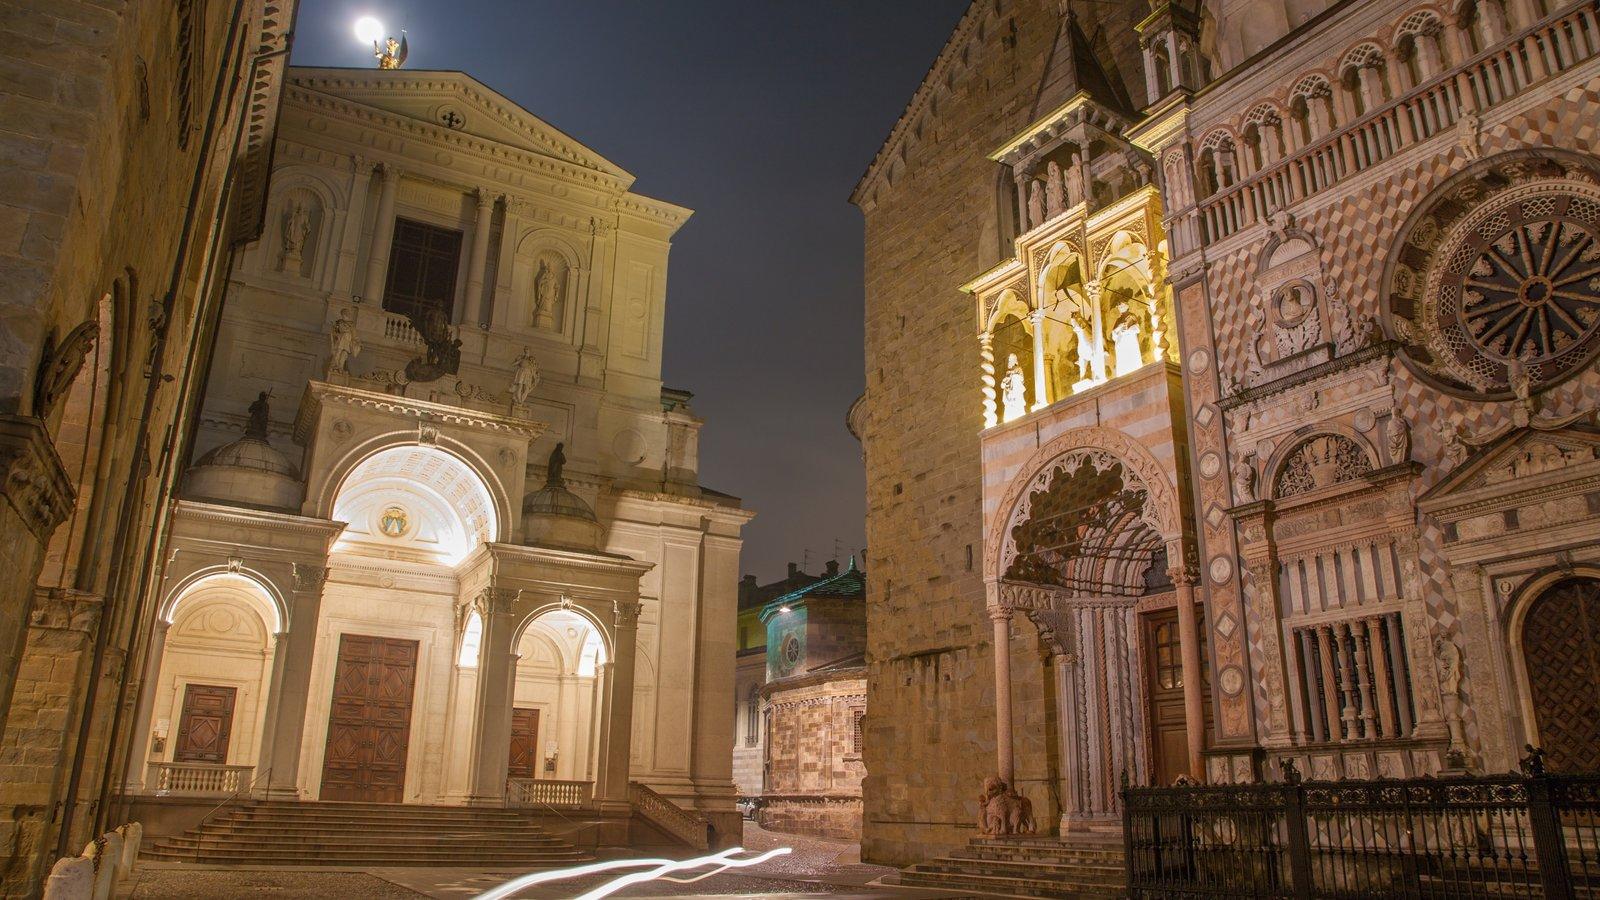 Bérgamo caracterizando cenas noturnas e arquitetura de patrimônio